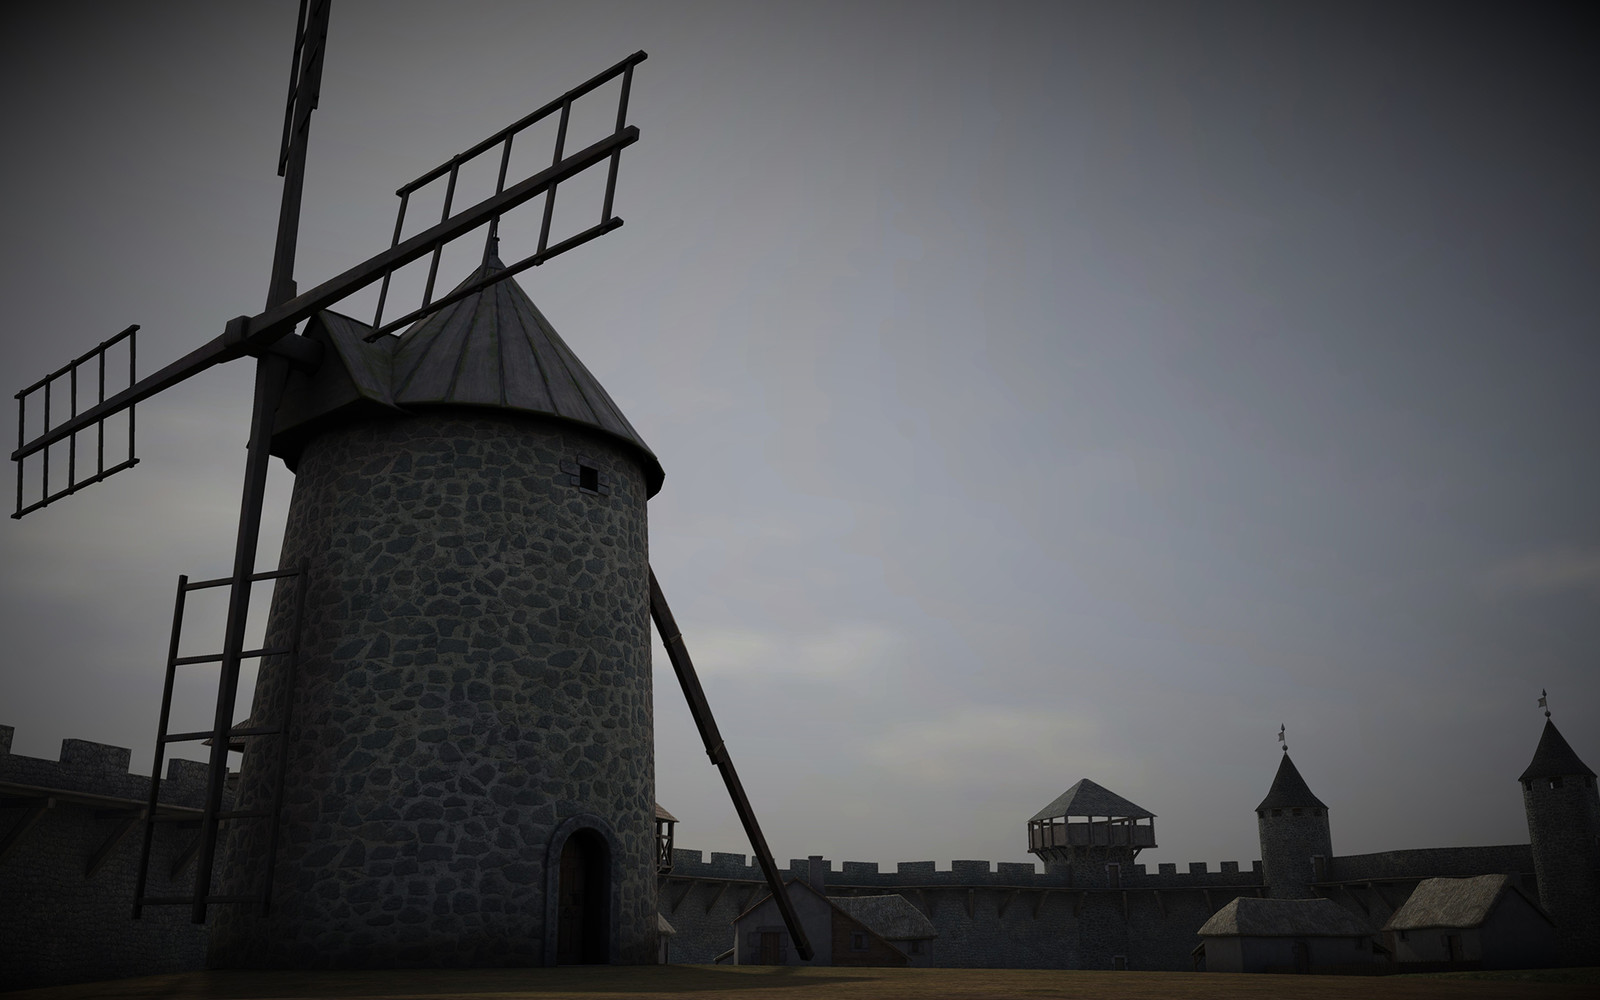 Carlat Fortress